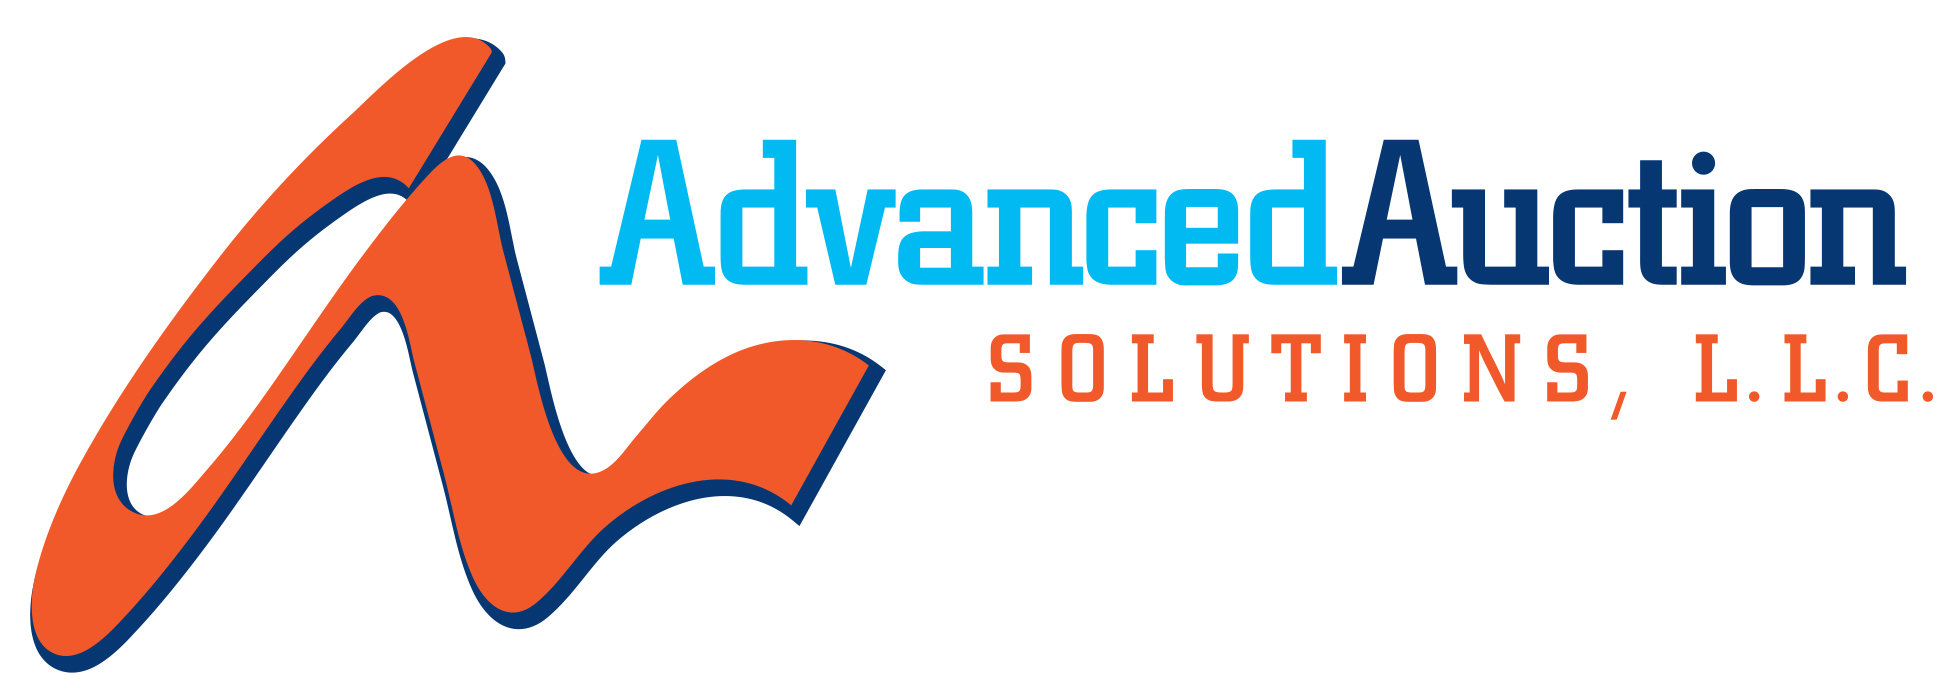 Advanced Auction Solutions, LLC